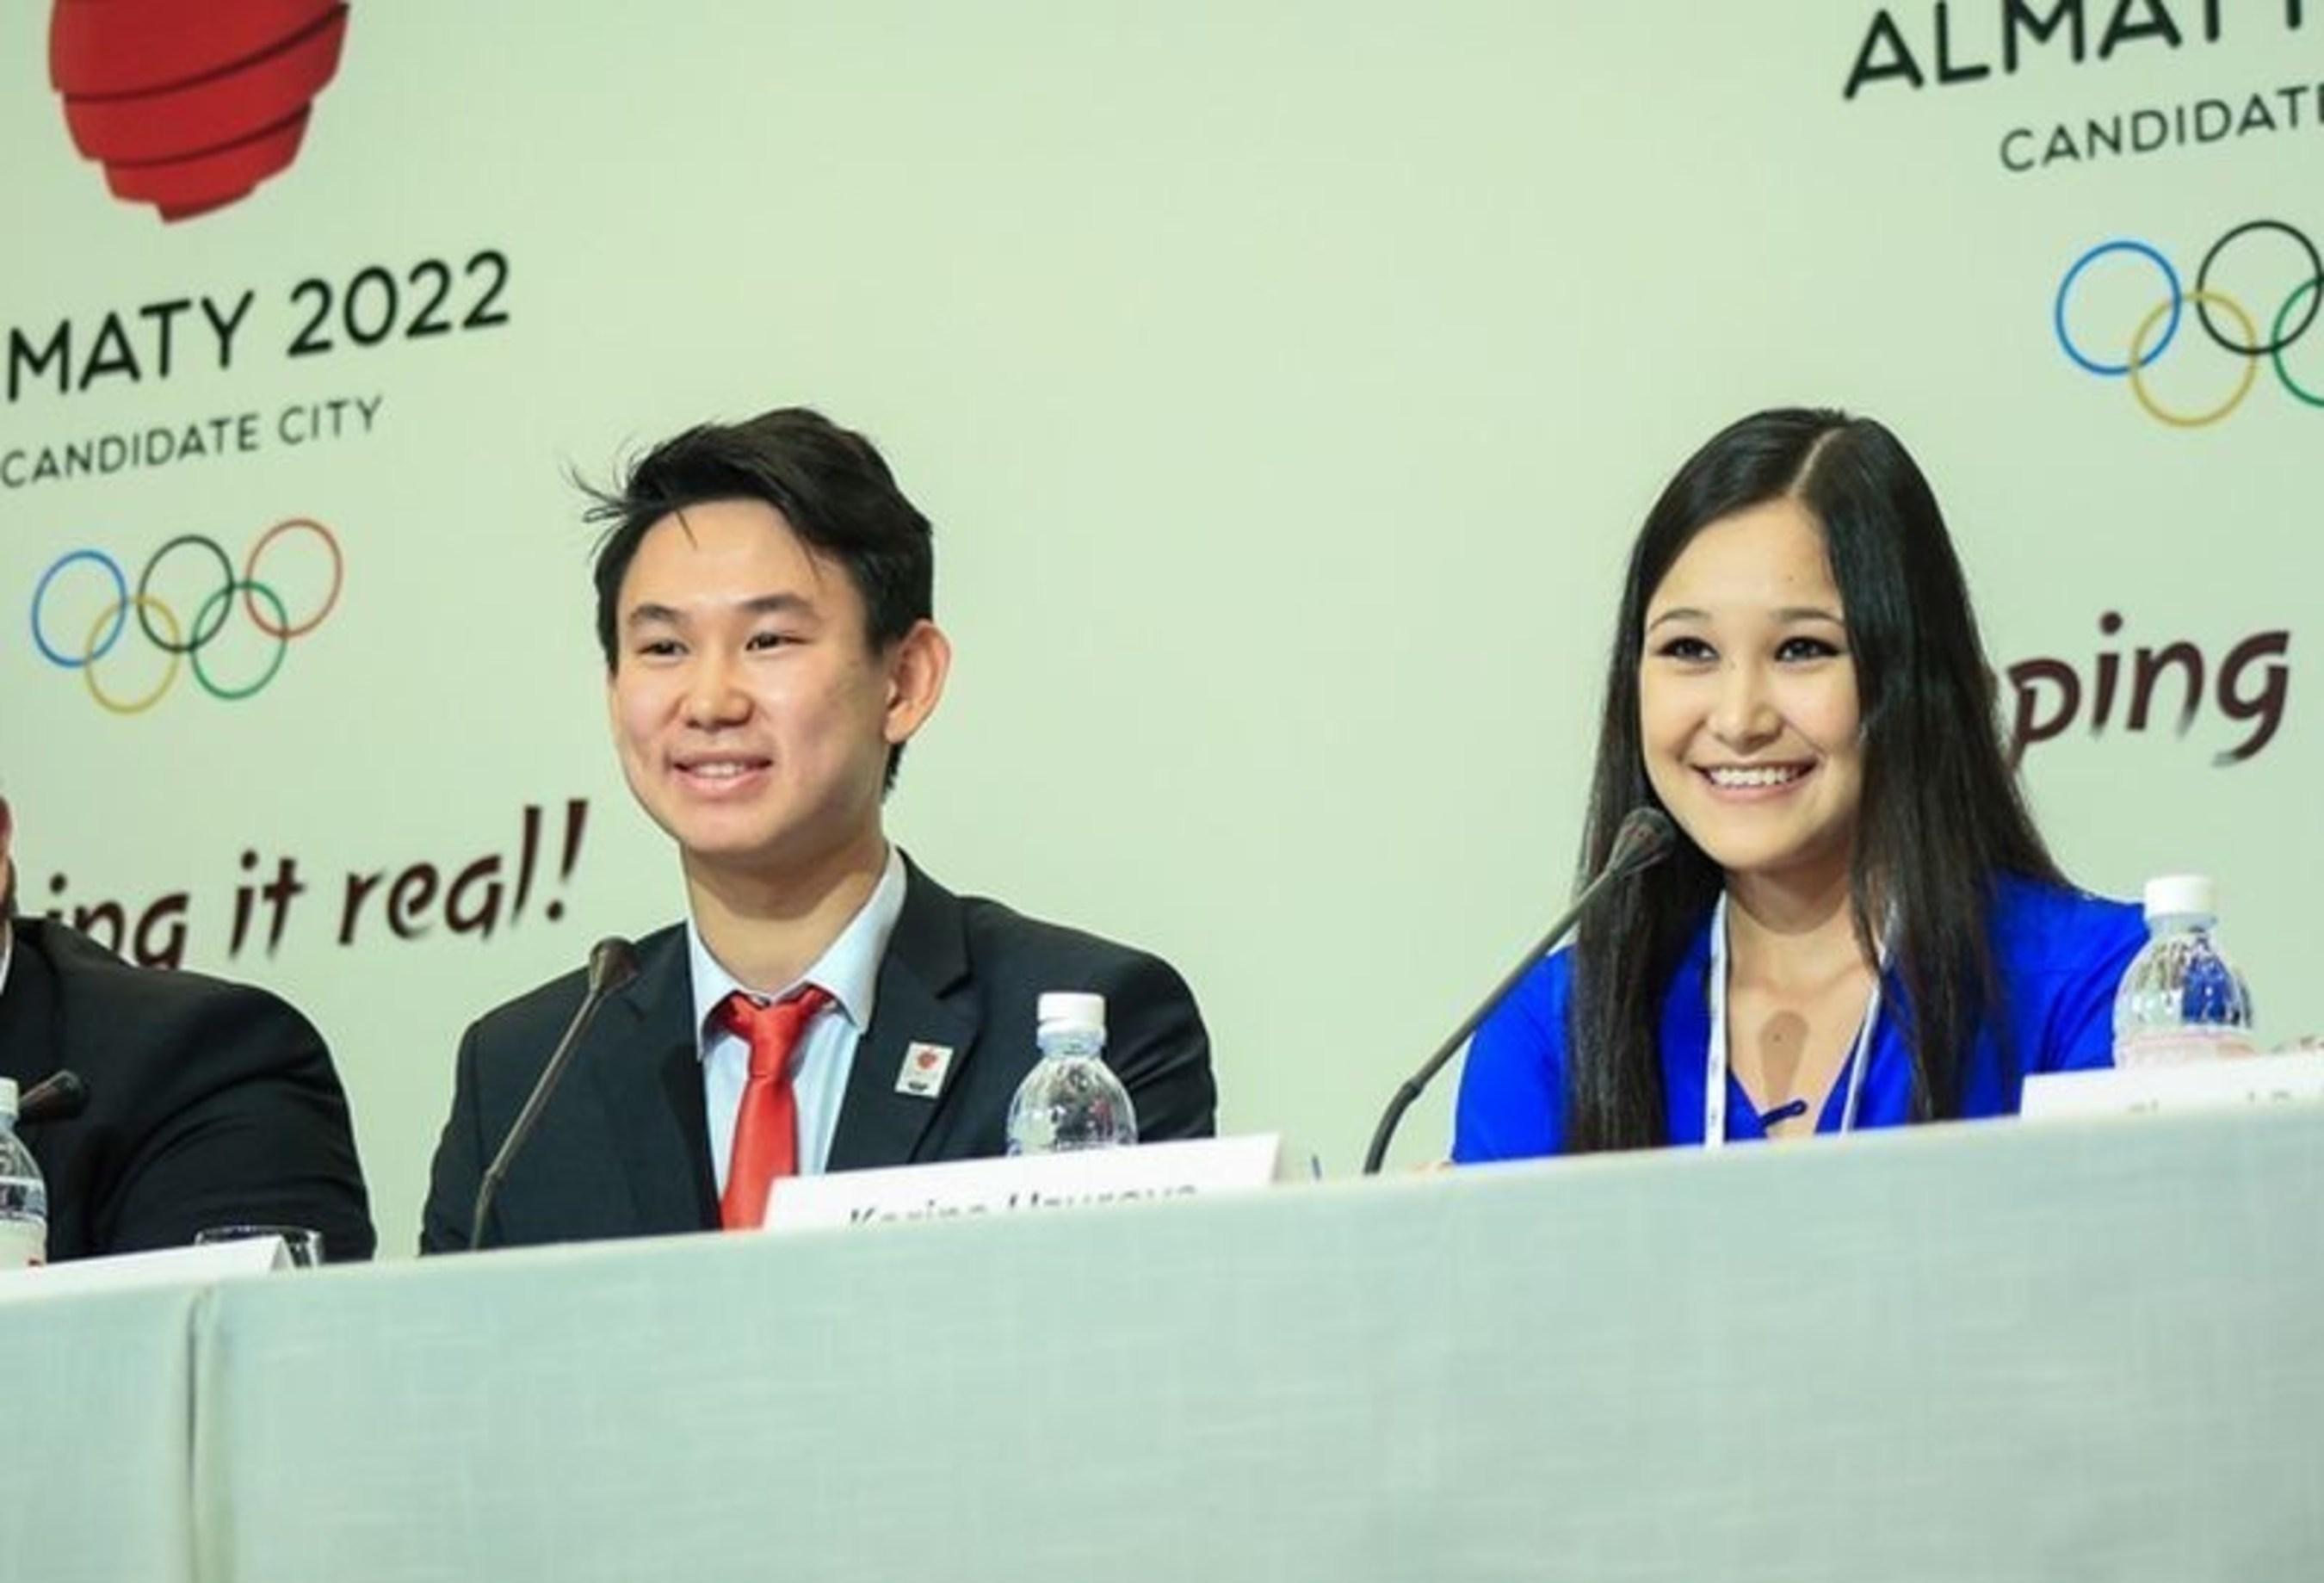 Mr. Denis Ten, Kazakhstan National Team Ice Dancer and Ms. Karina Uzurova, Innsbruck 2012 Youth Olympian (PRNewsFoto/Almaty 2022 Candidate city) (PRNewsFoto/Almaty 2022 Candidate city)